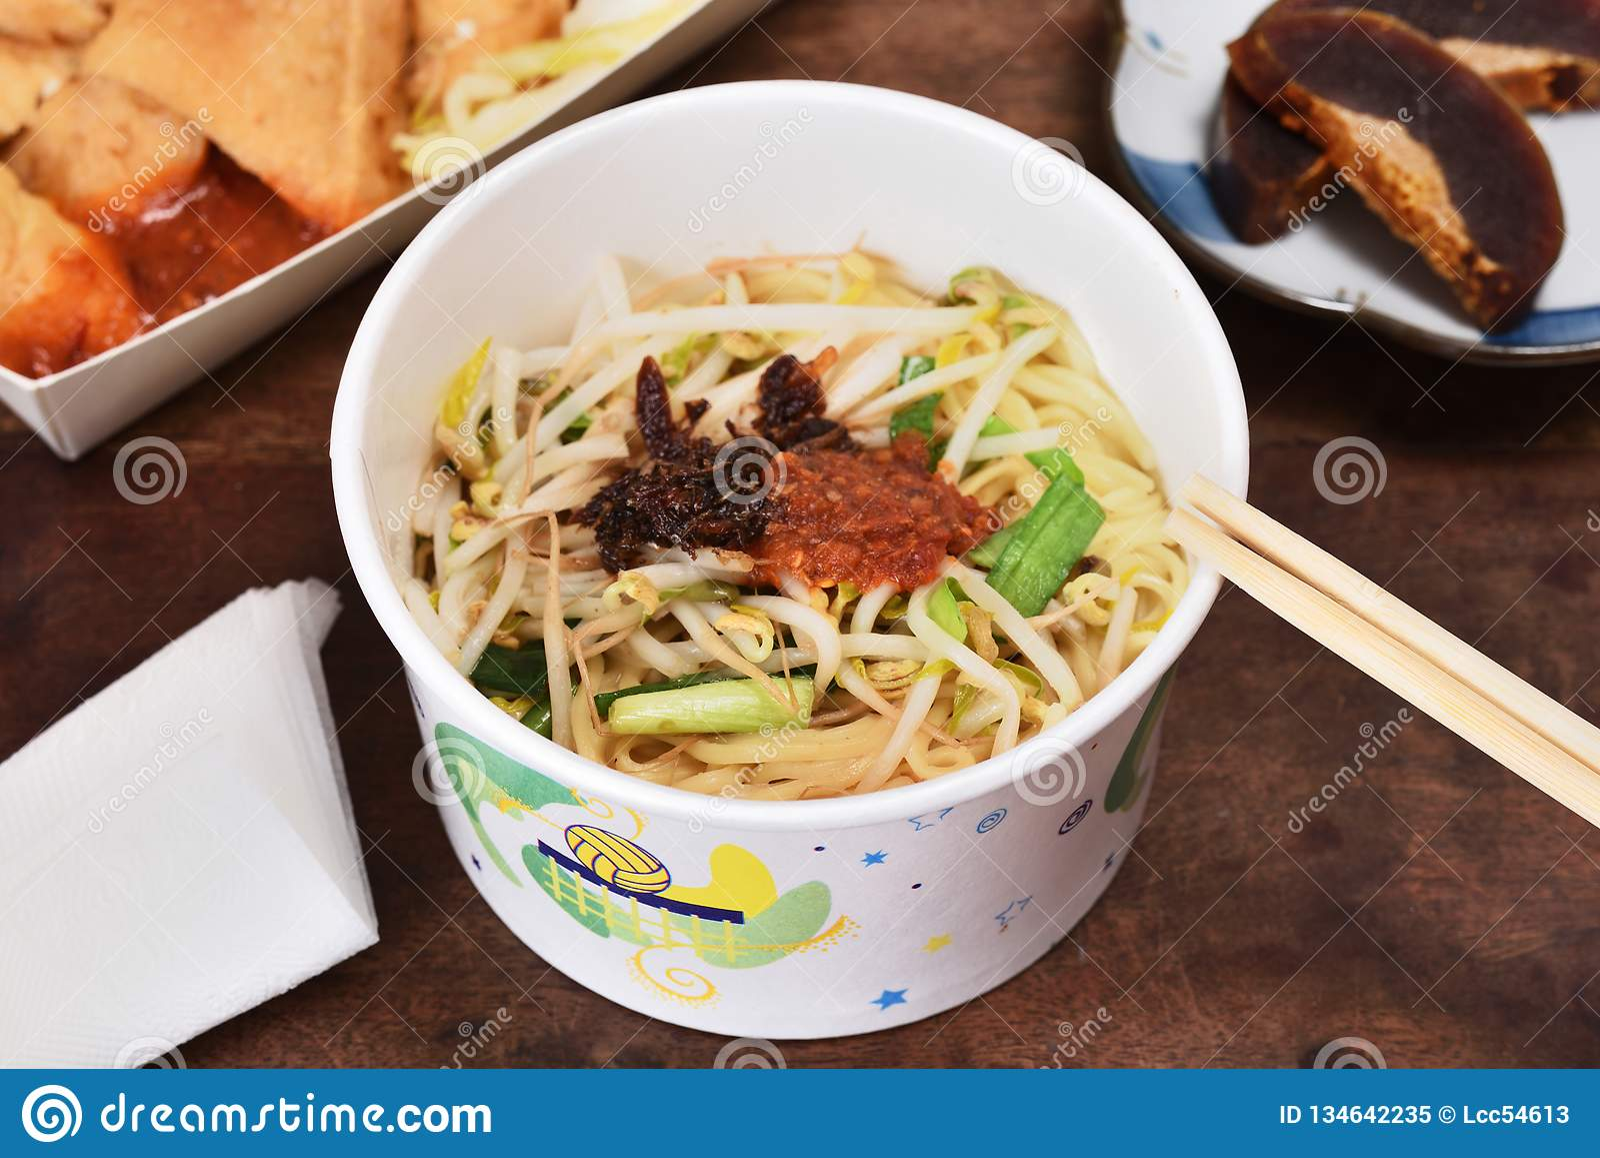 Takeaway Carton Bowl Noodles Stock Image Image Of Cuisine Dish